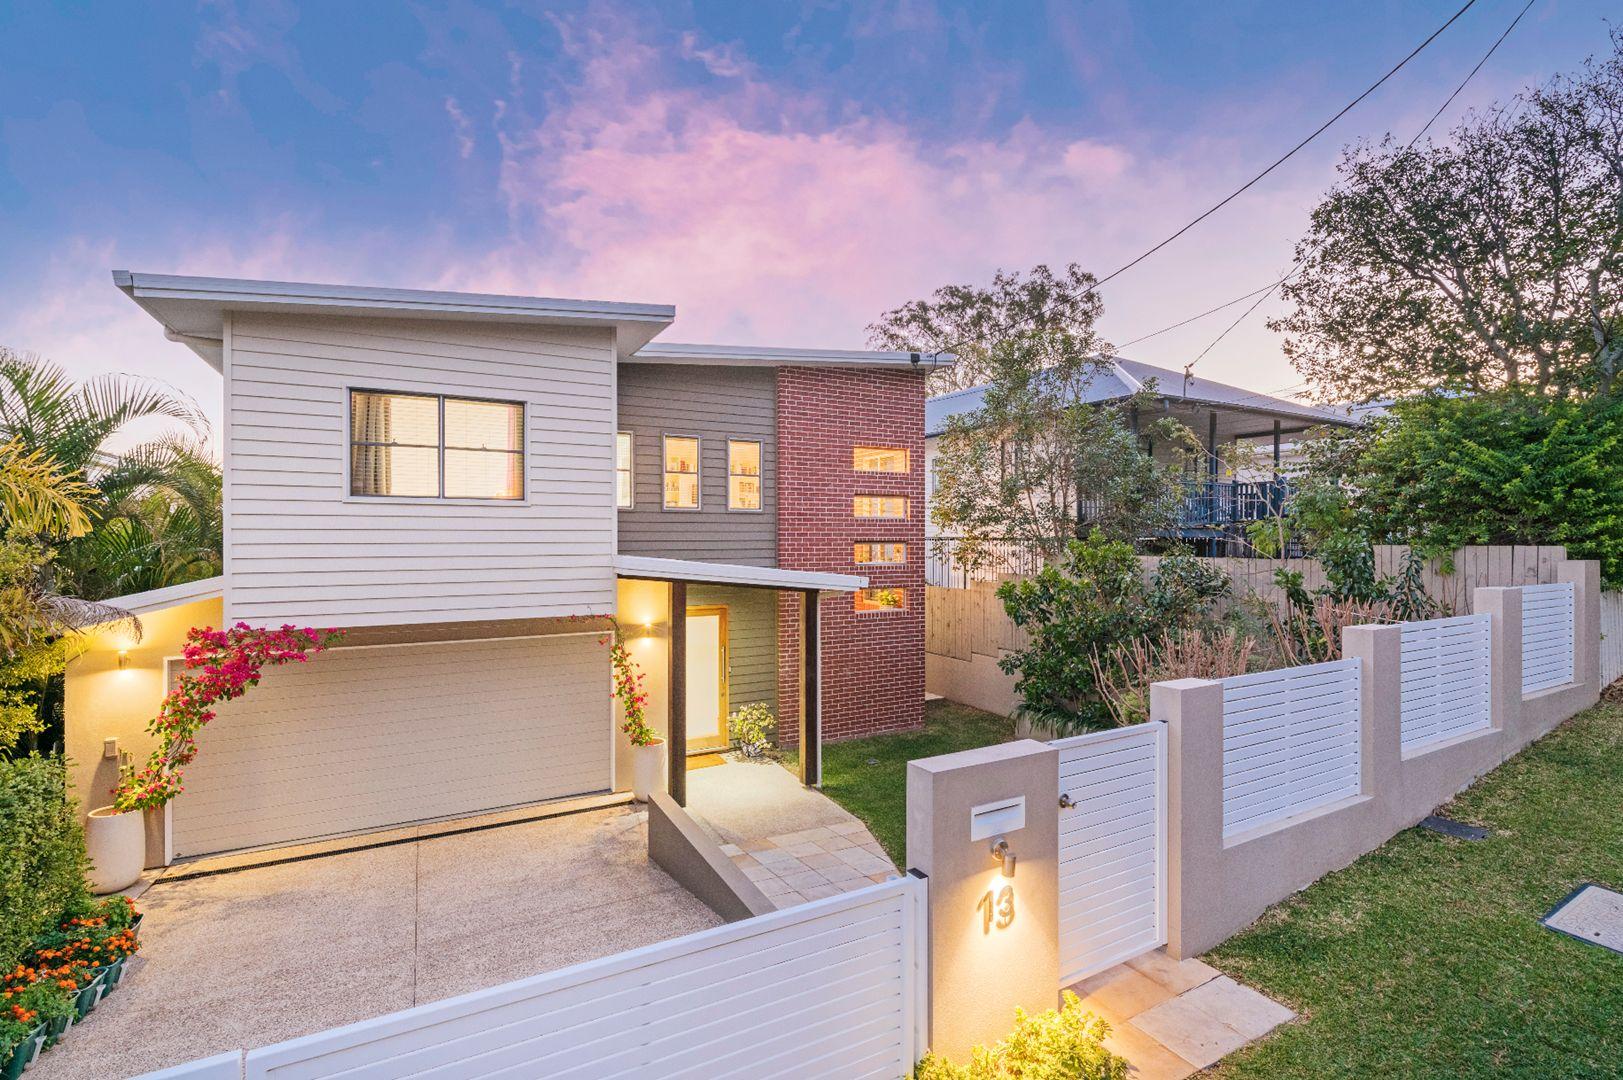 13 Tugulawa Street, Balmoral QLD 4171, Image 0